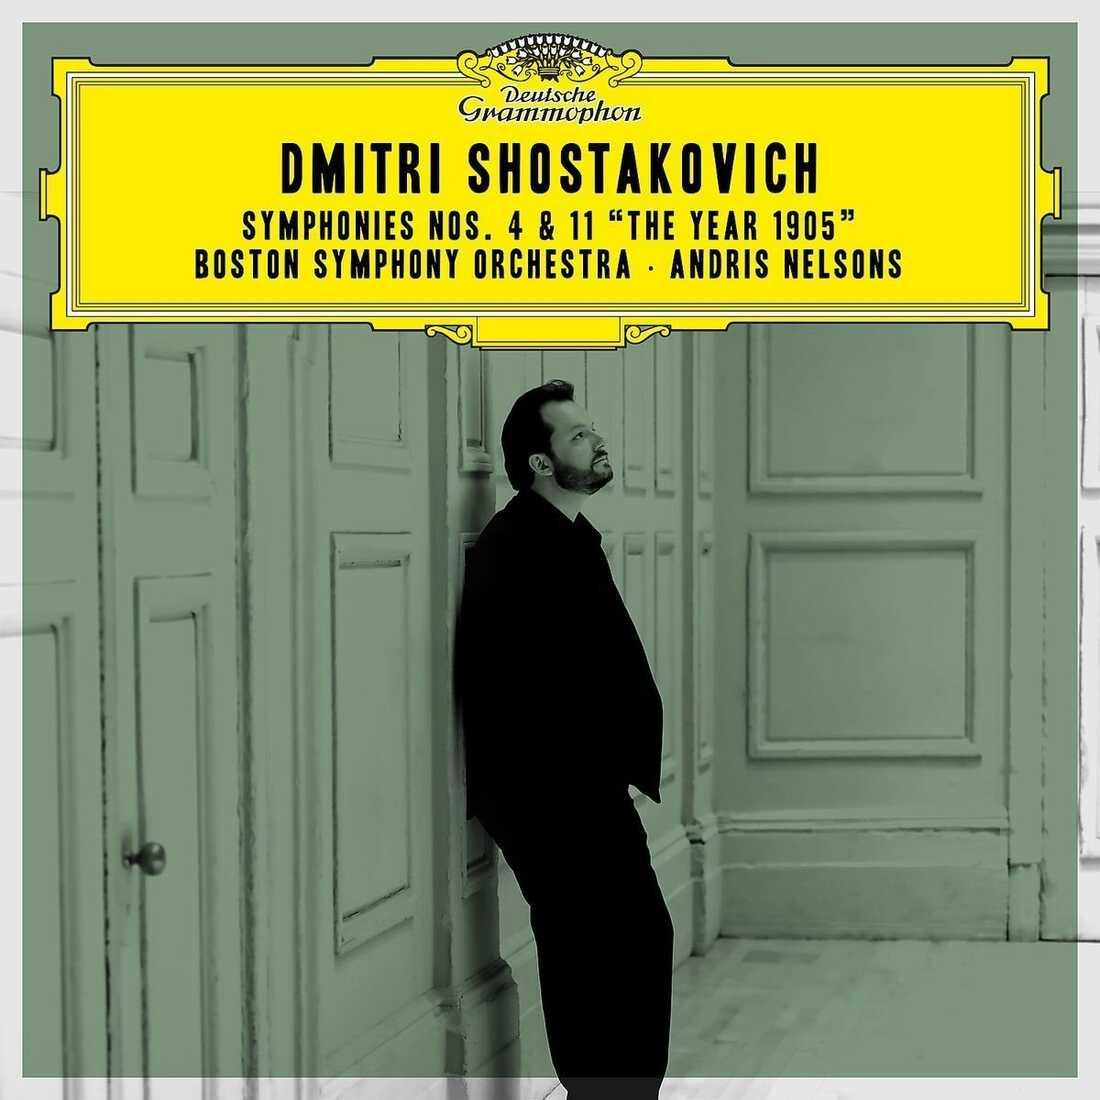 Boston Symphony Orchestra & Andris Nelsons, Shostakovich, Symphonies Nos. 4 & 11